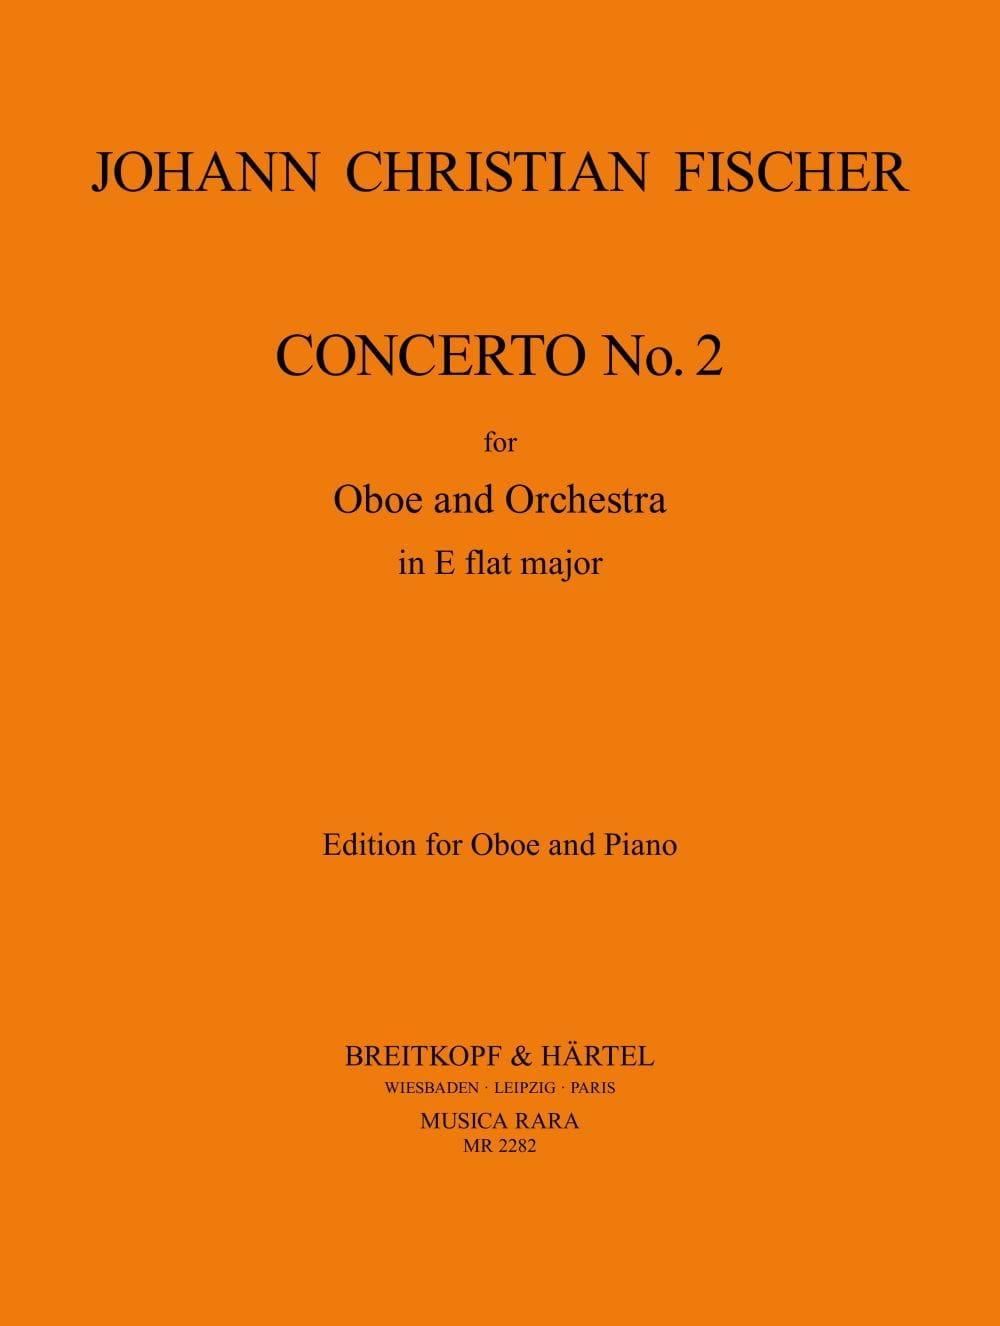 Concerto n° 2 for Oboe in E flat major - laflutedepan.com